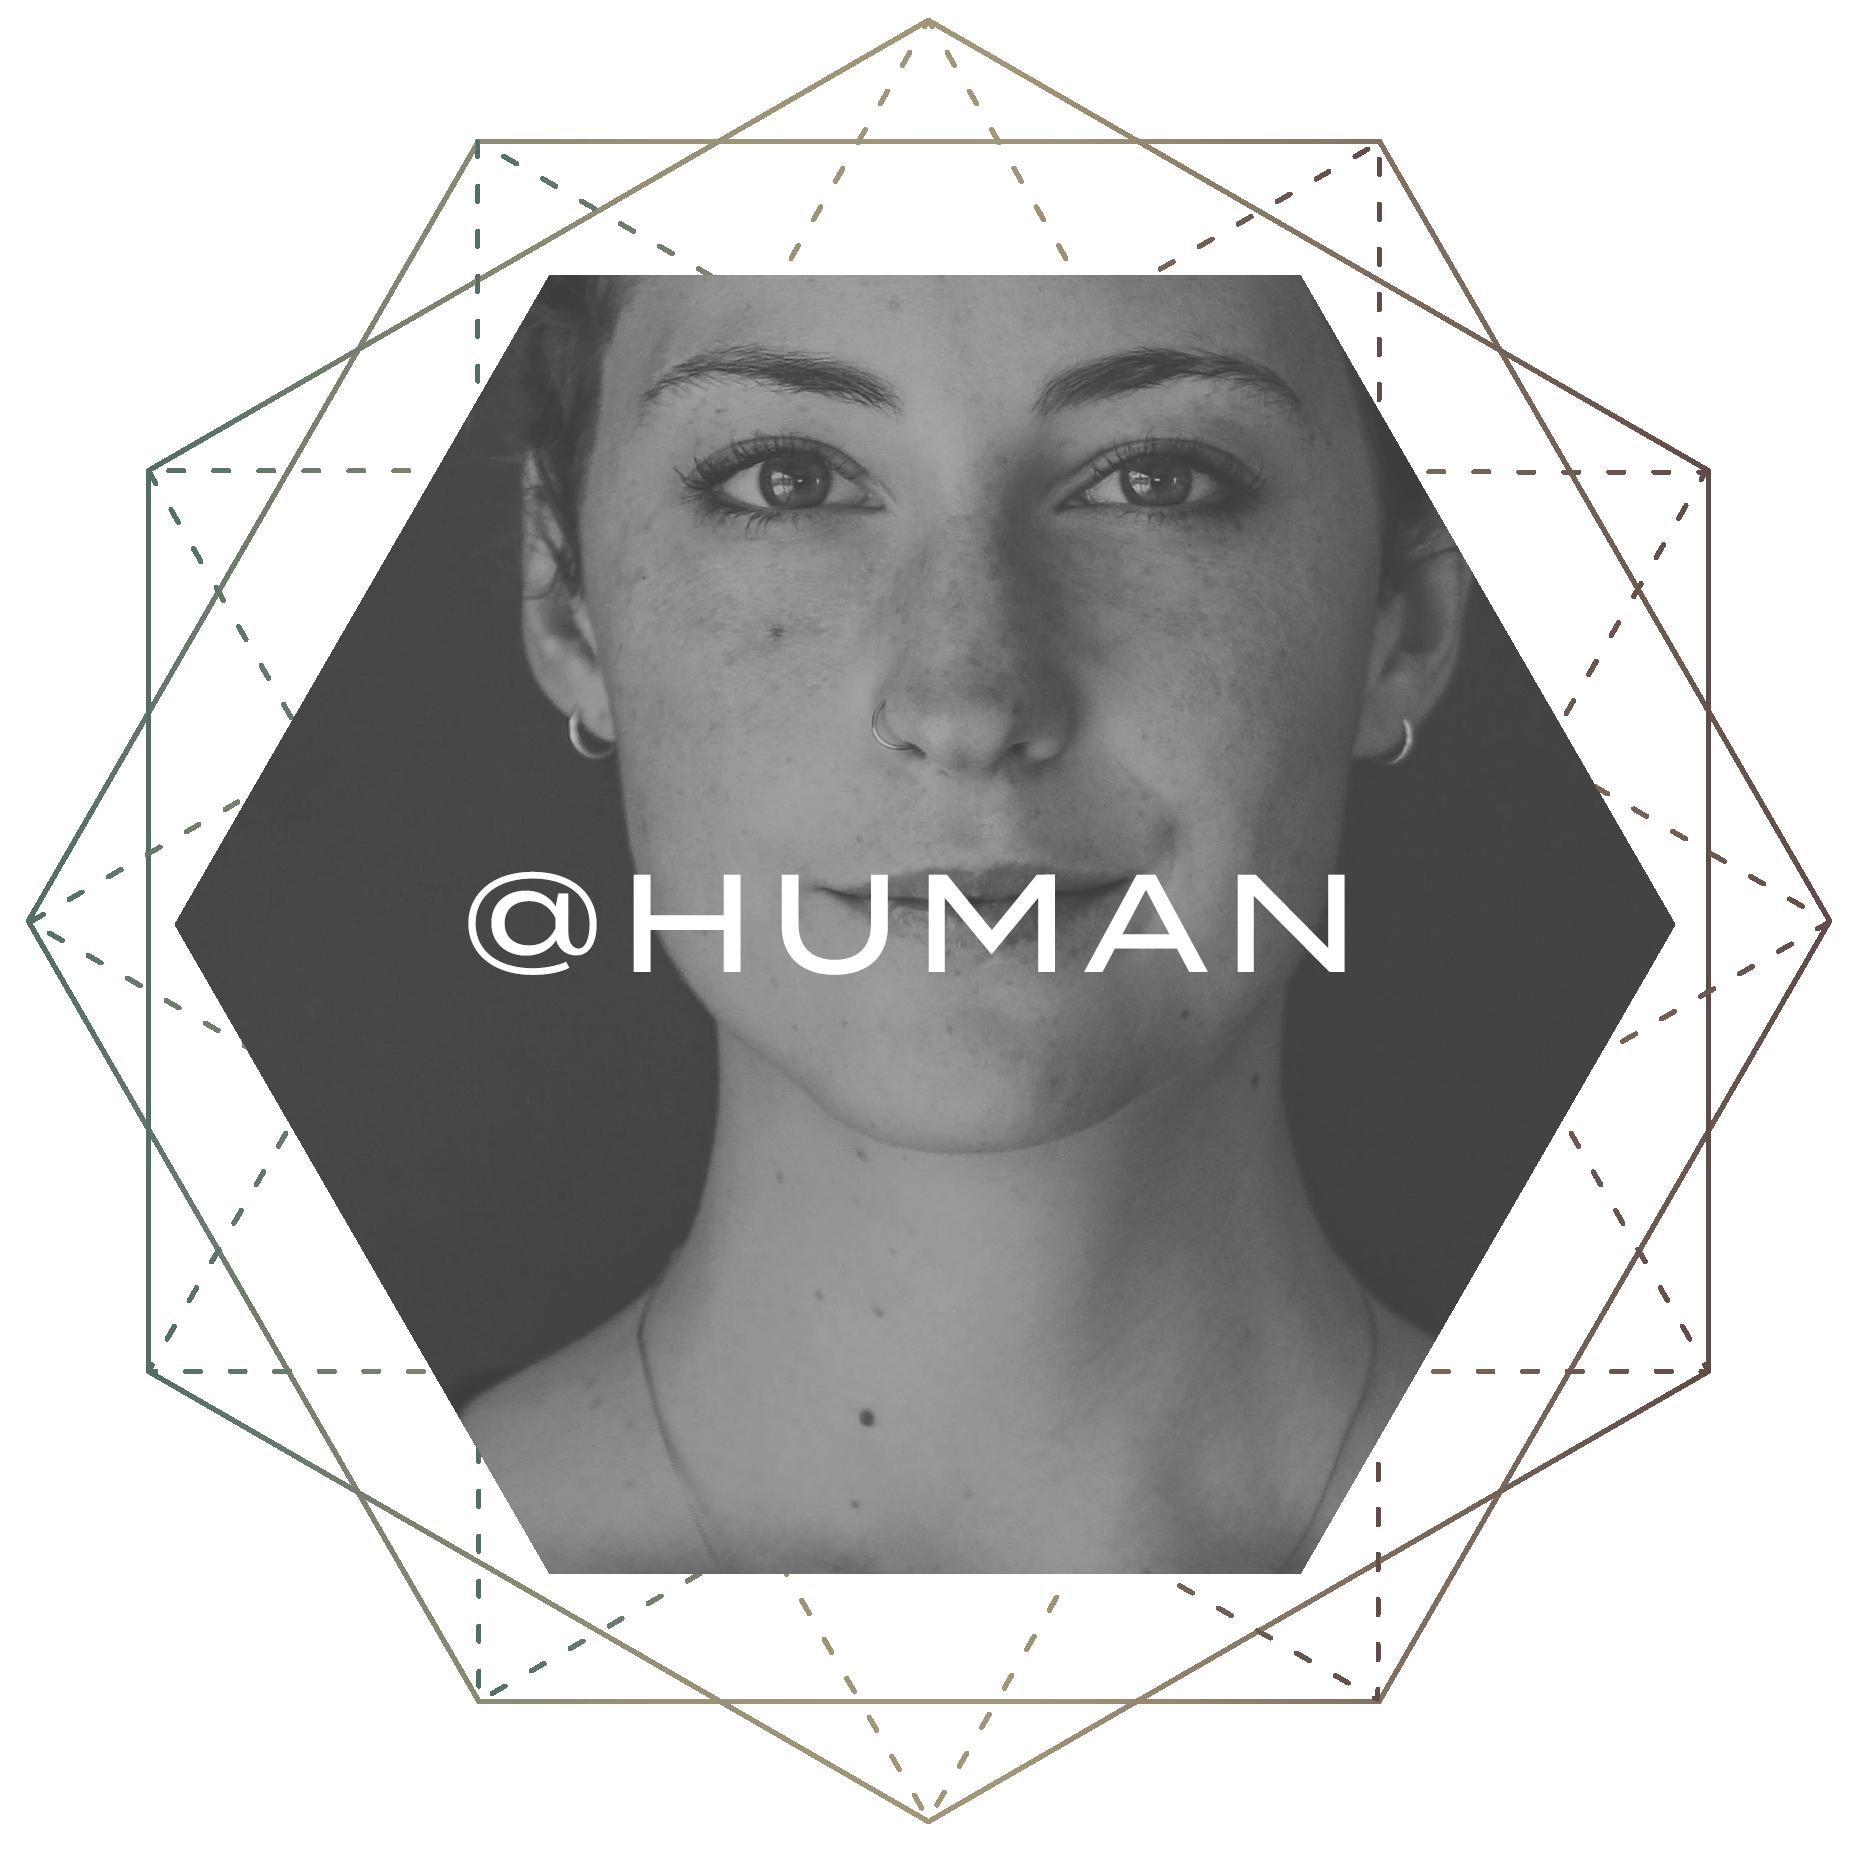 Humans-5